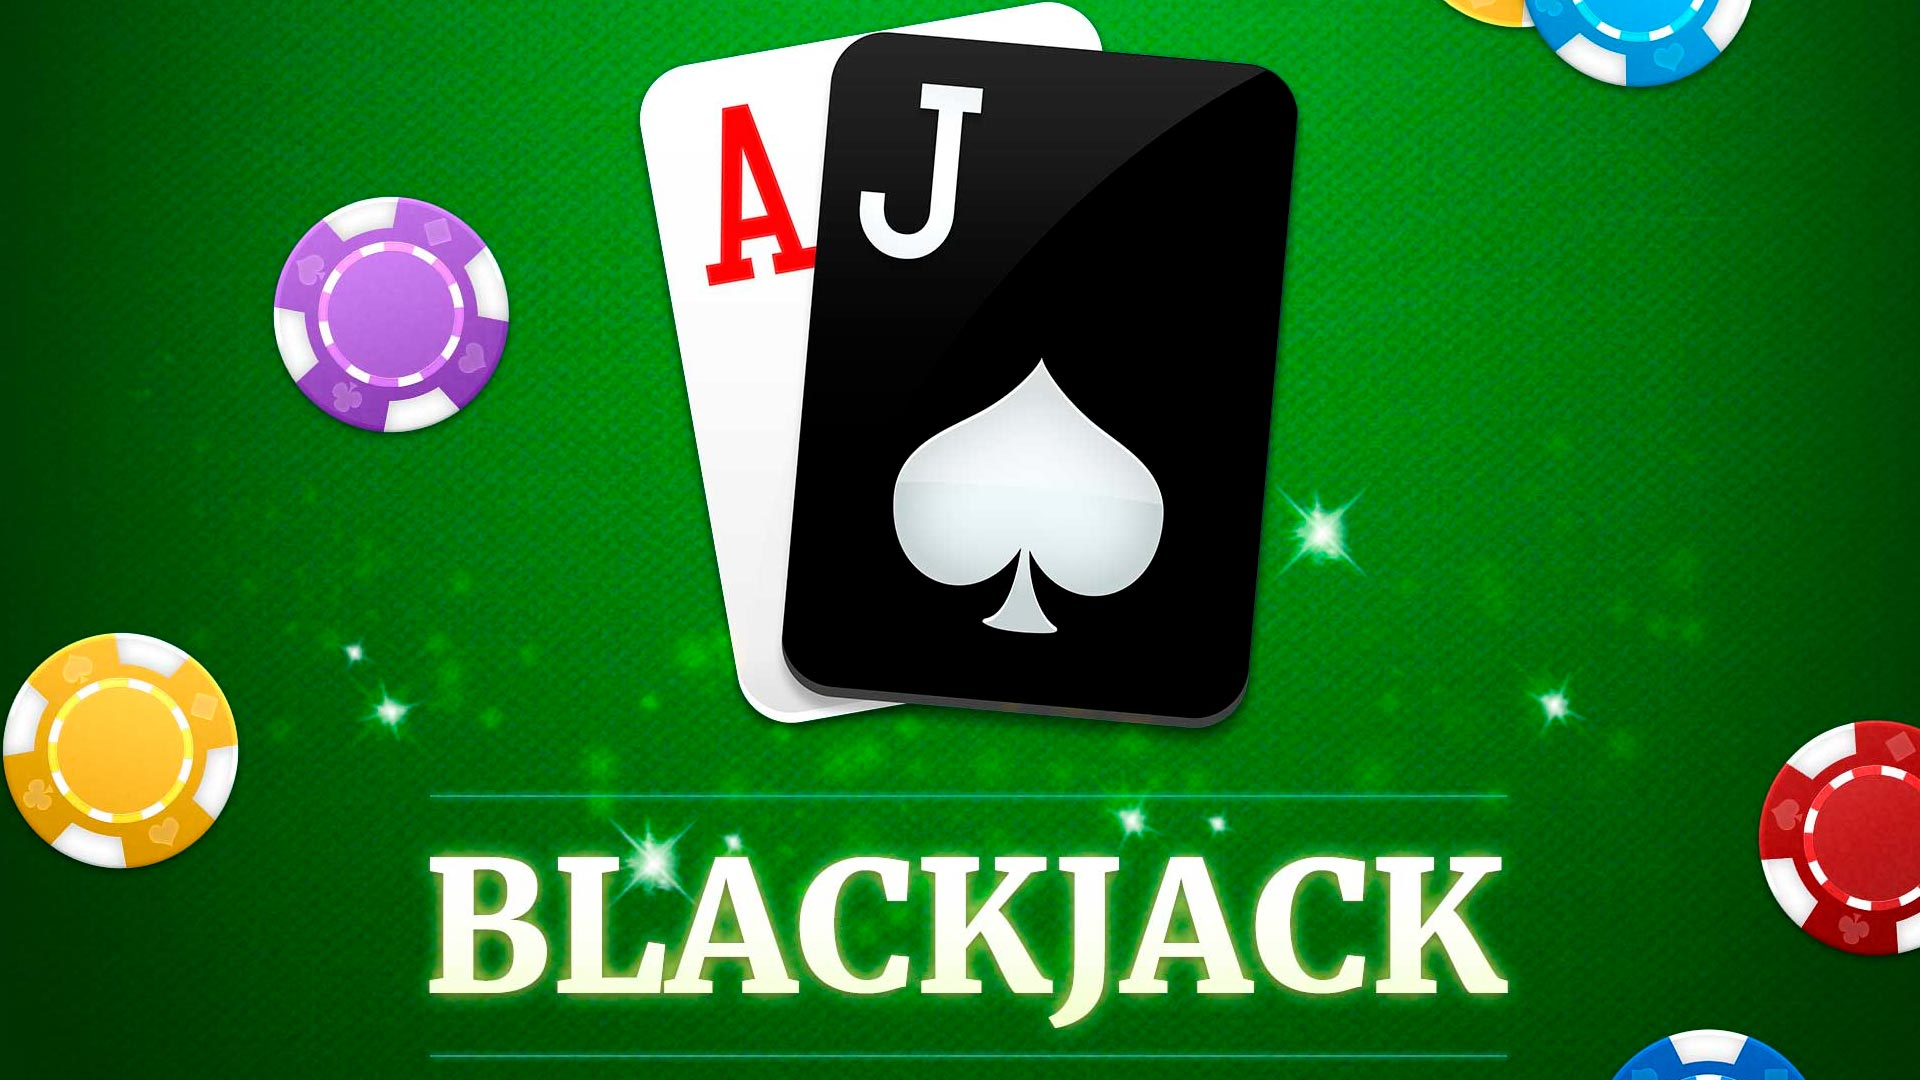 Strateġiji u ċipep ta 'Blackjack